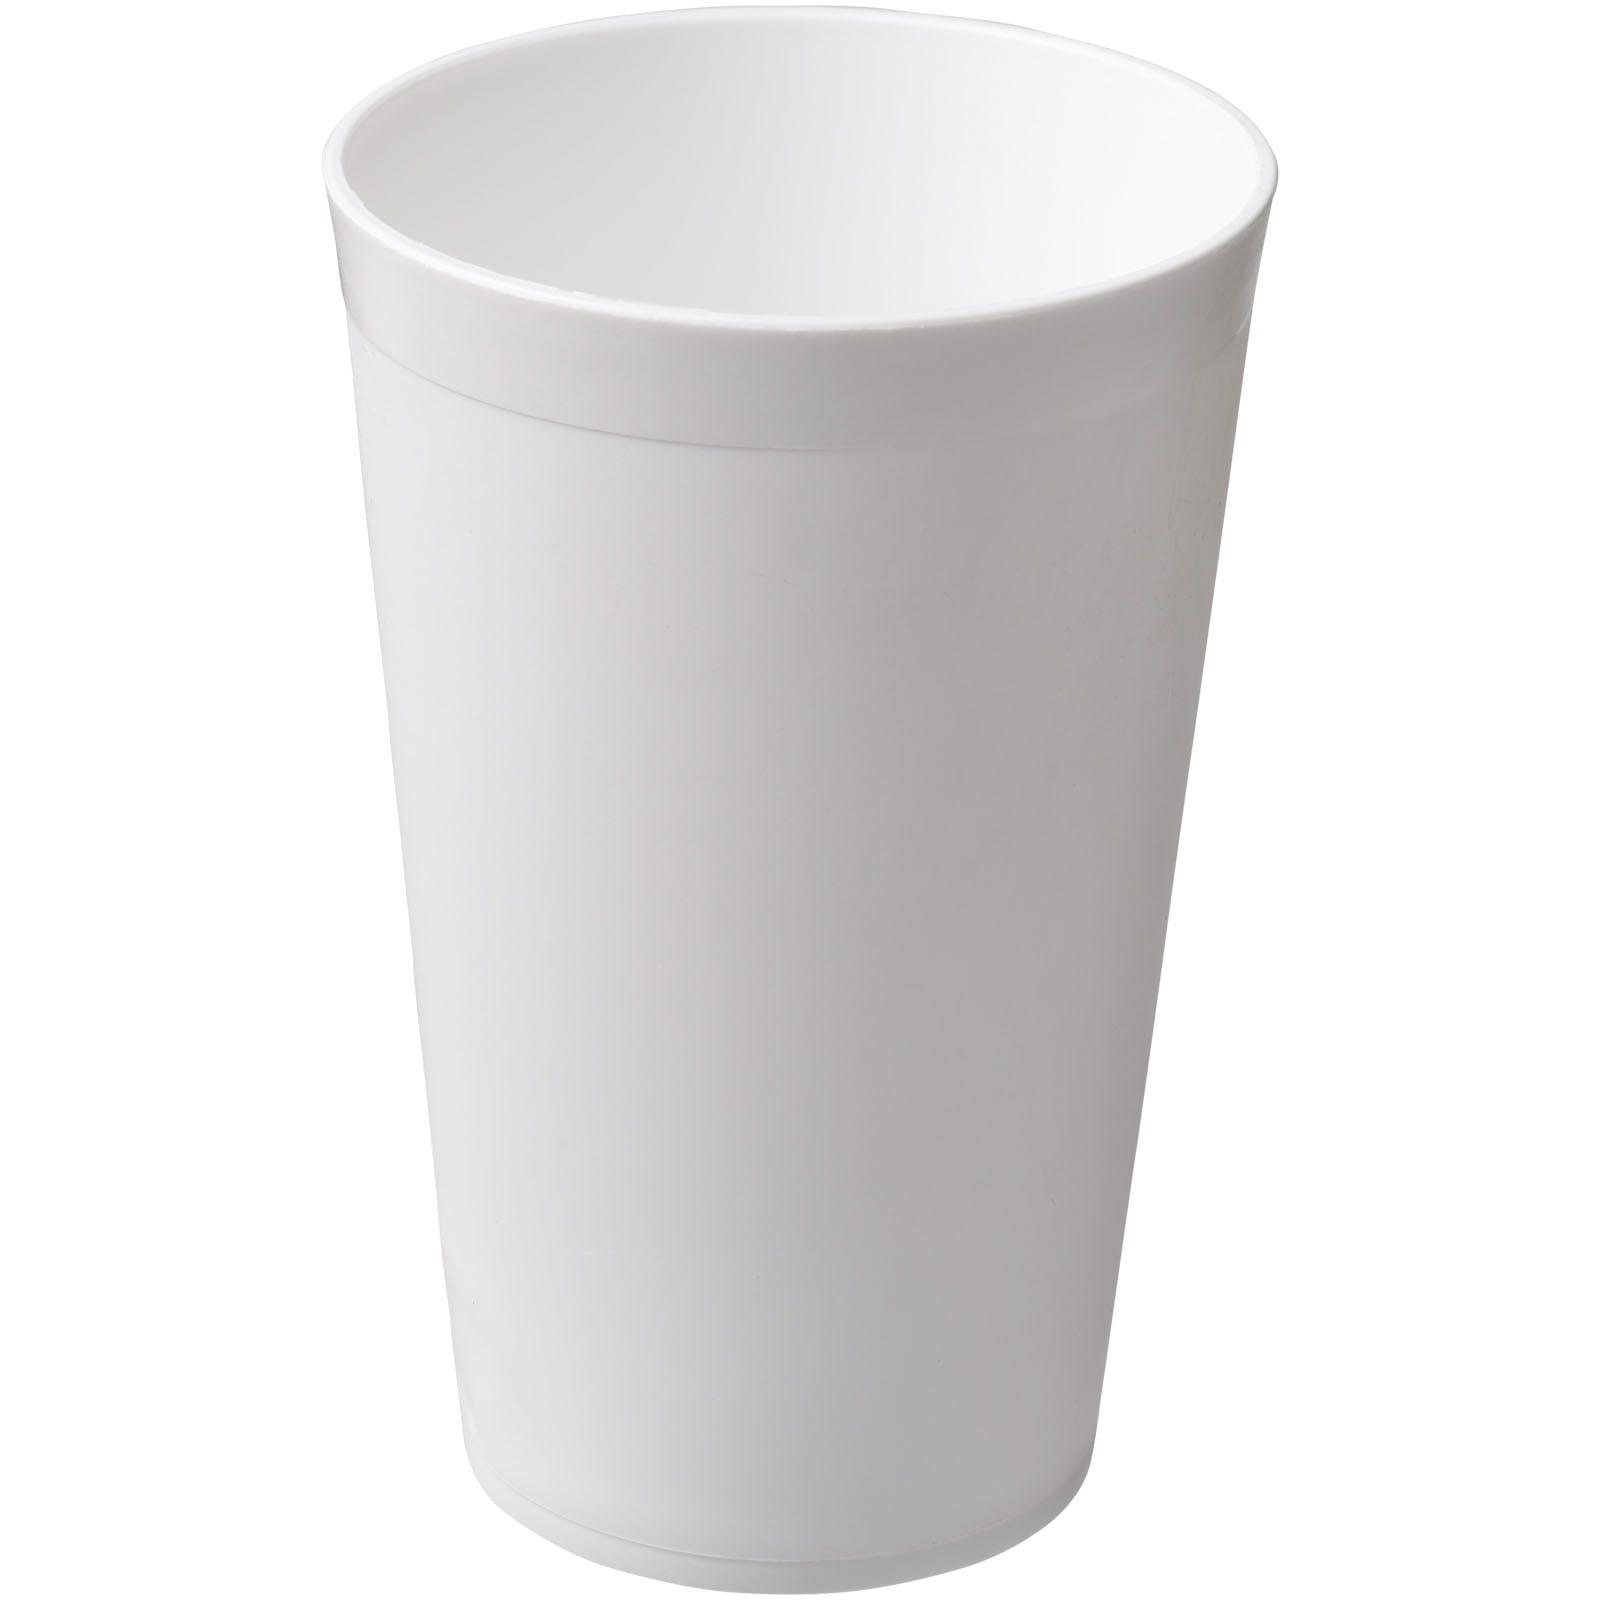 Drench 300 ml plastic tumbler - White